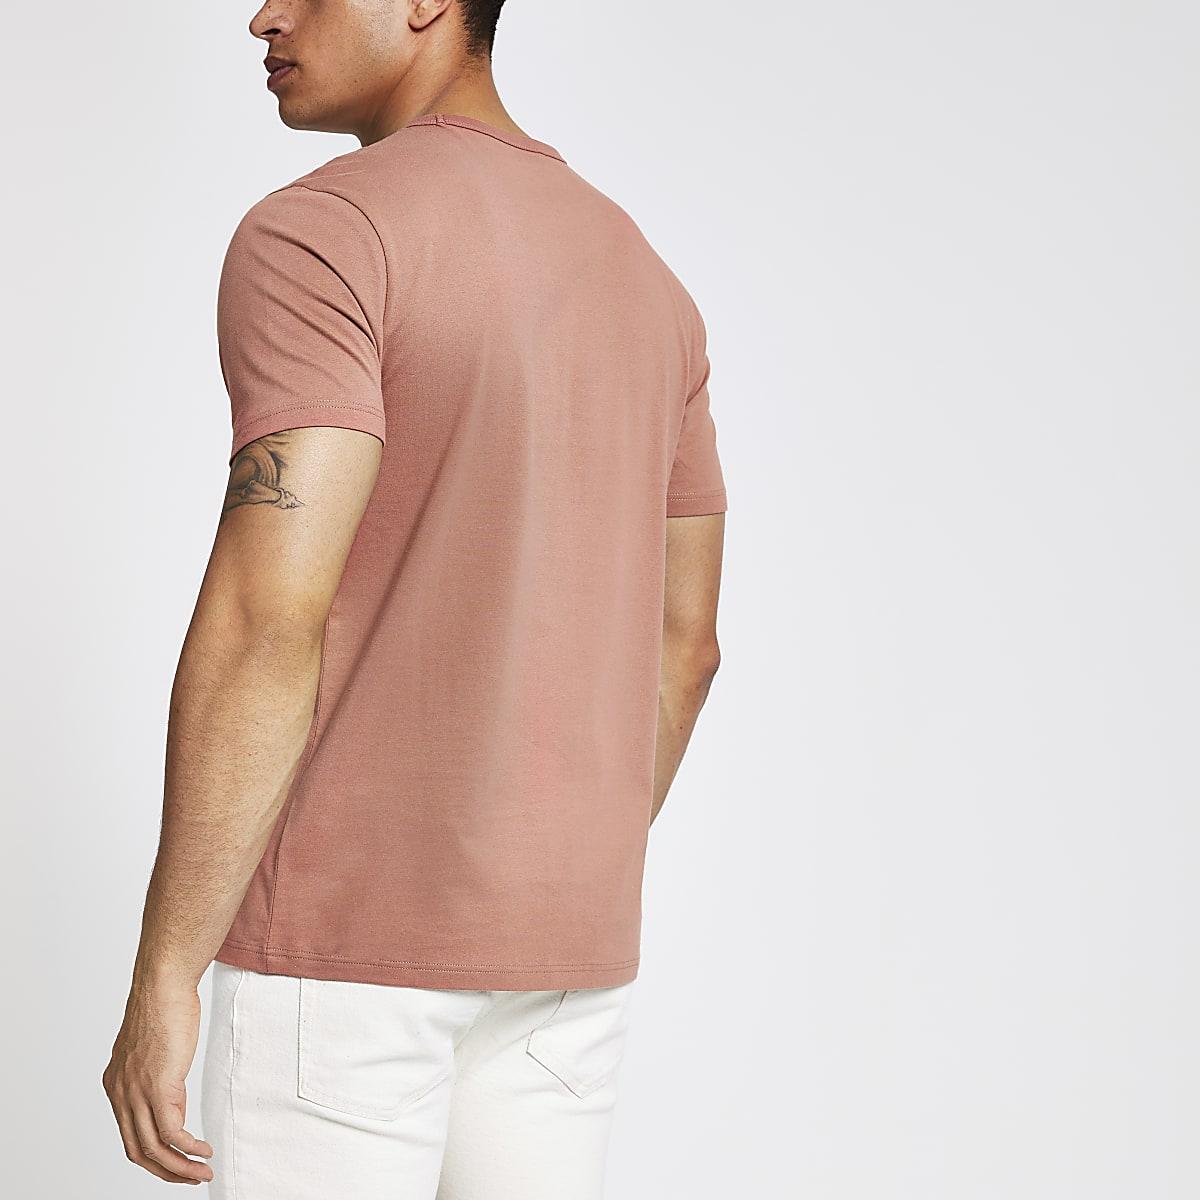 b58ac22aa676 Rust slim fit crew neck T-shirt - T-shirts - T-Shirts & Vests - men